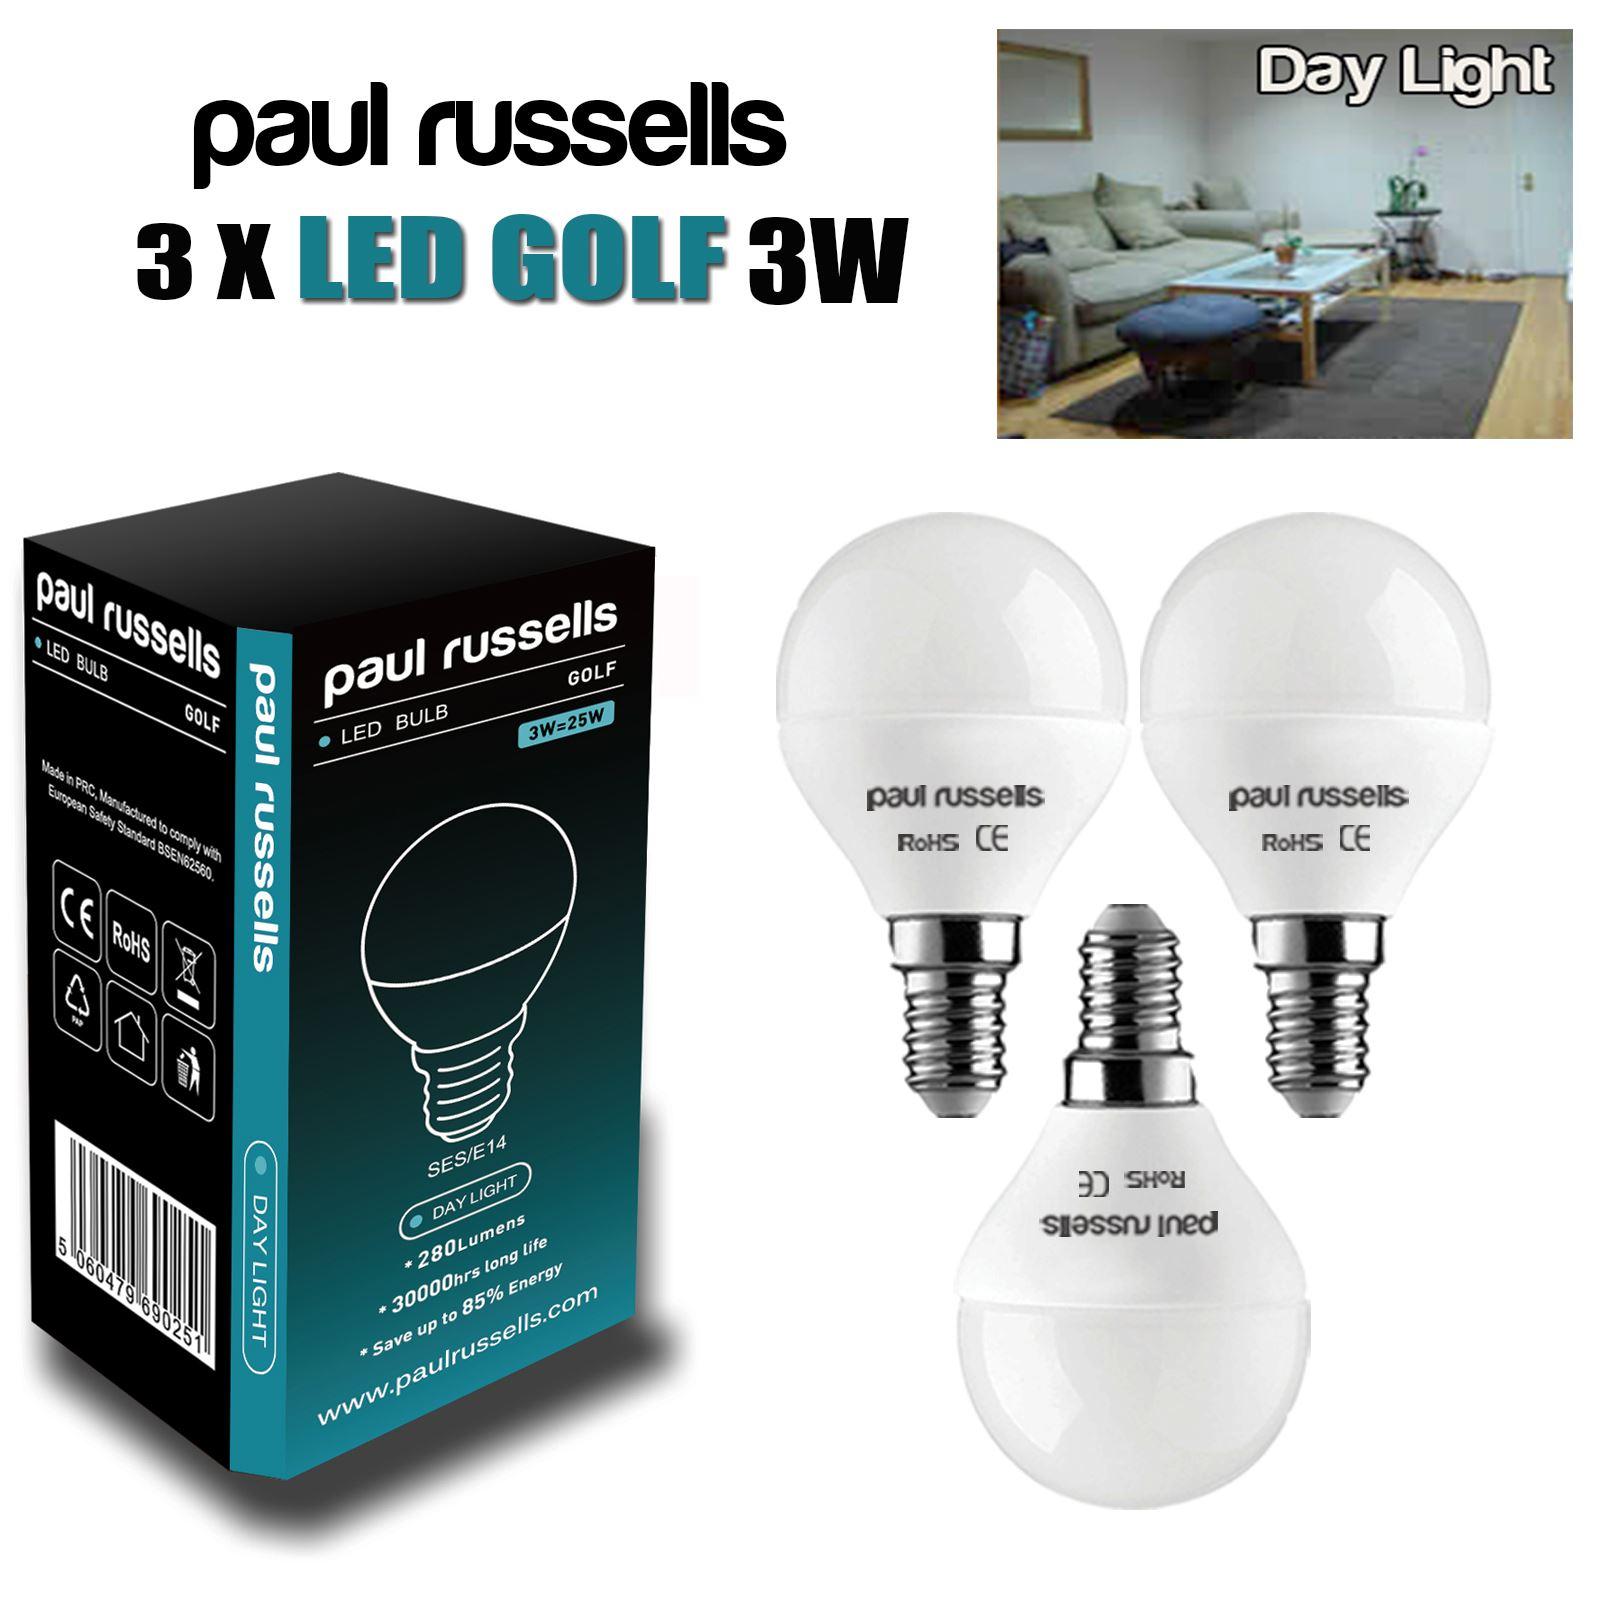 E14 B22 E27 Led Light Bulbs Cheap Long Life 25w 40w 60w 100 Watt Equivalent Ebay